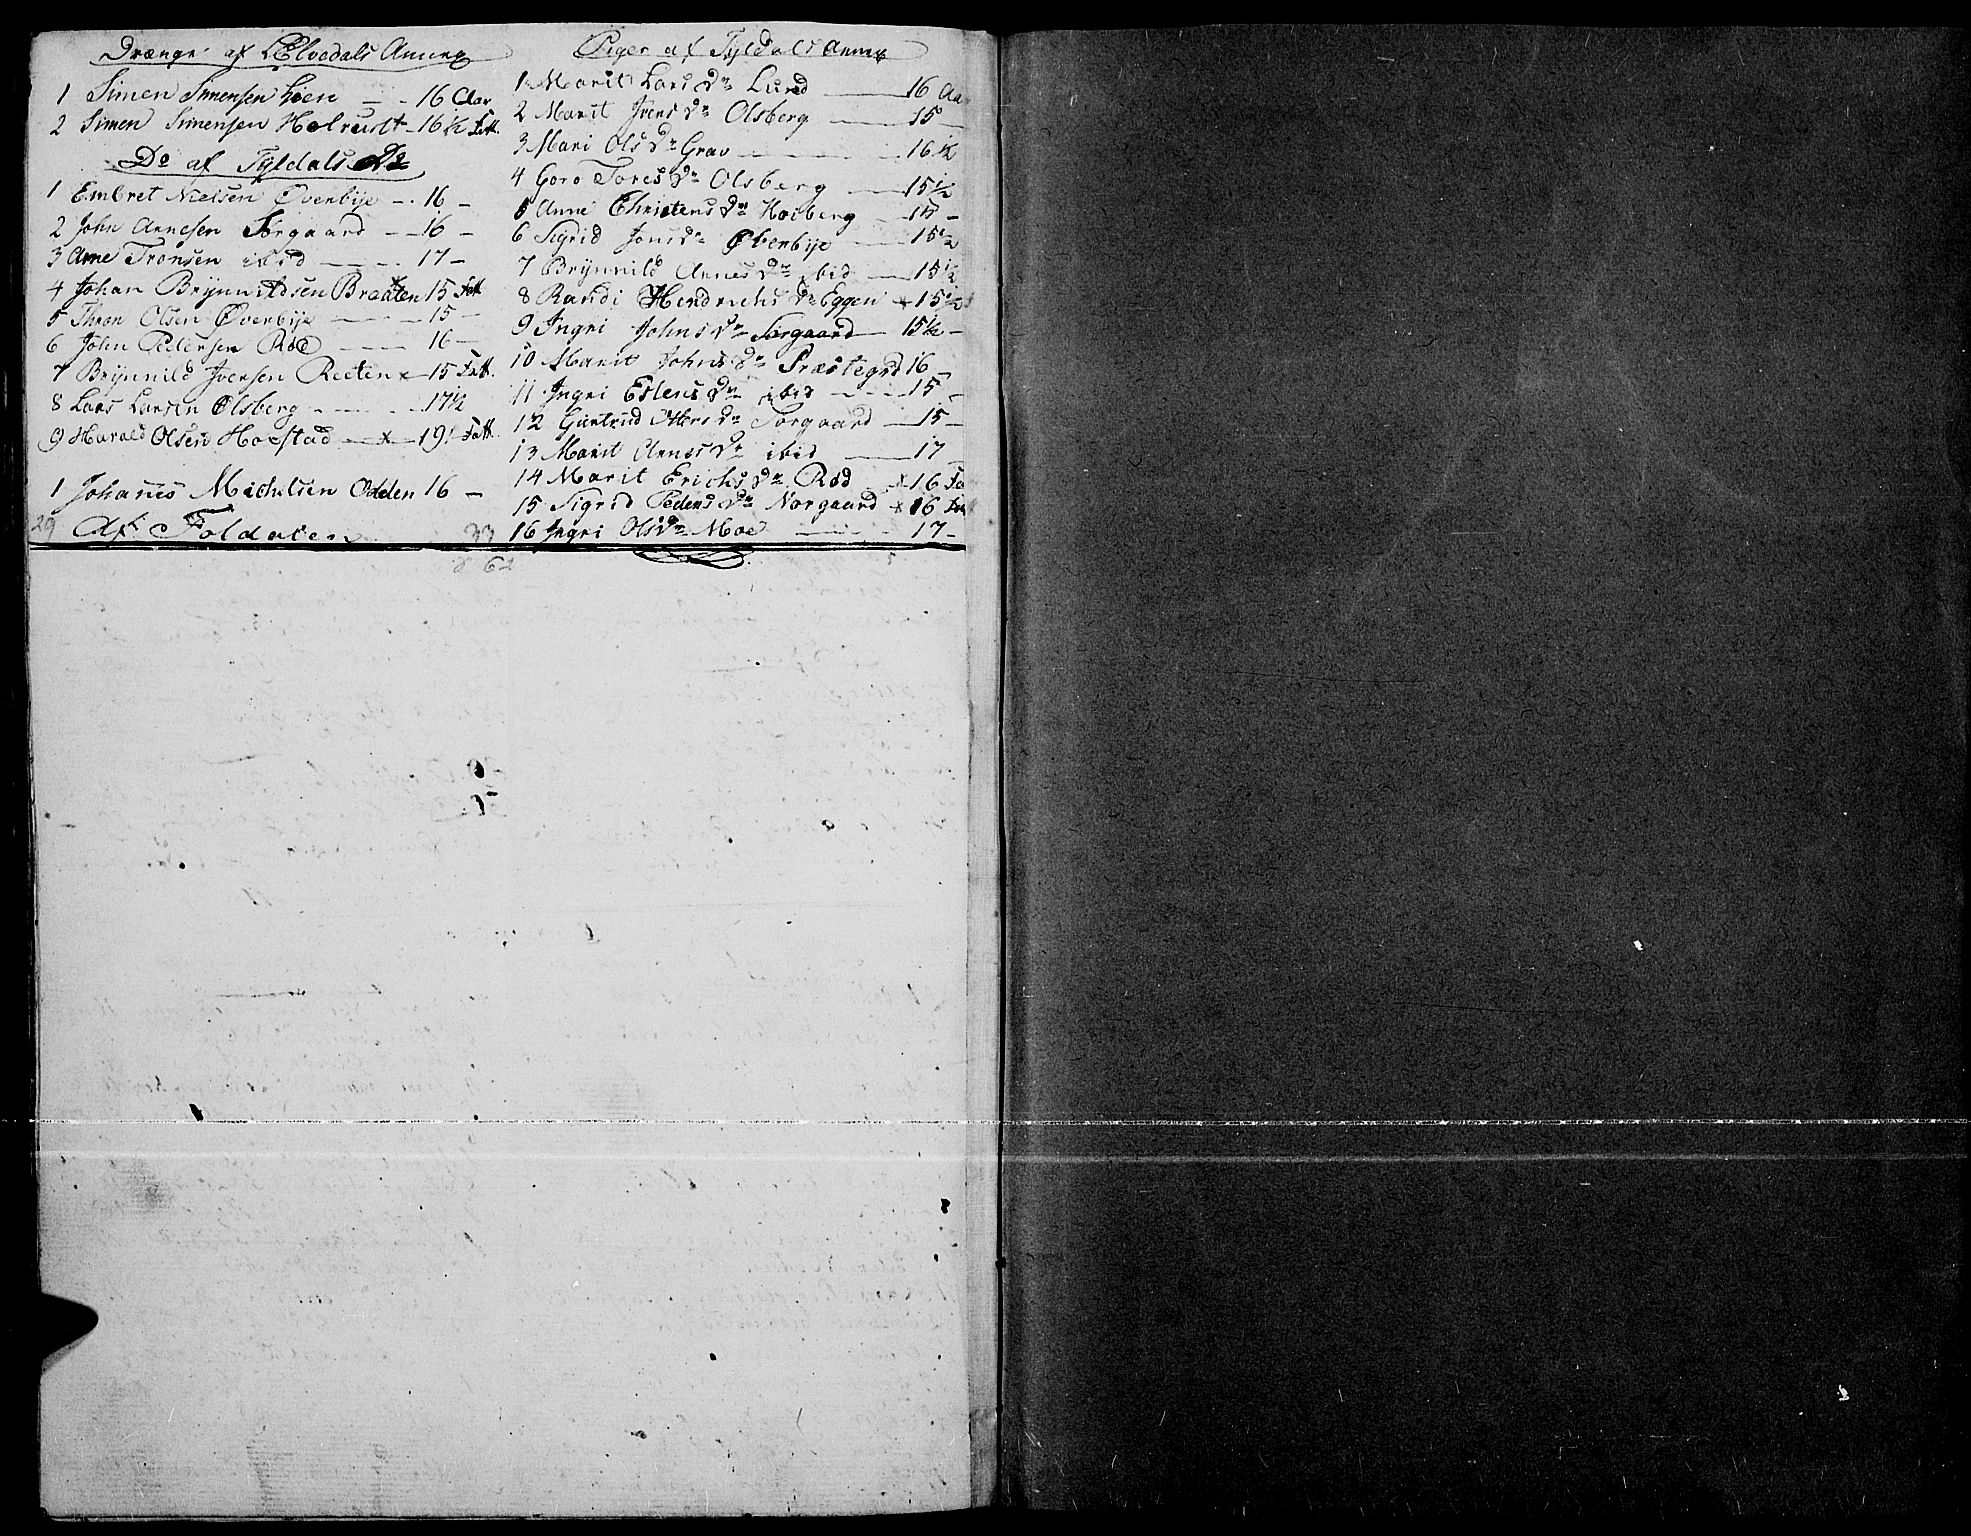 SAH, Tynset prestekontor, Ministerialbok nr. 15, 1801-1814, s. 78